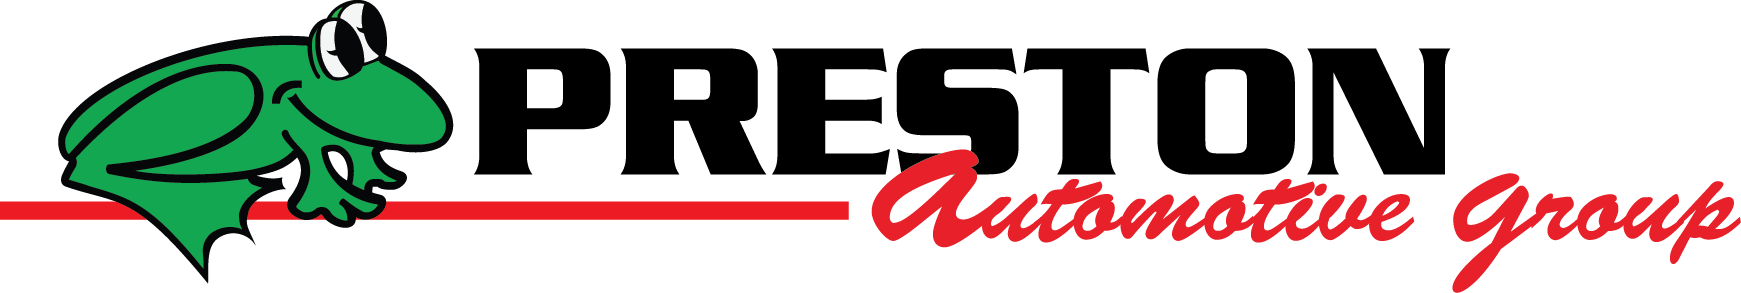 Preston Automotive Group Logo